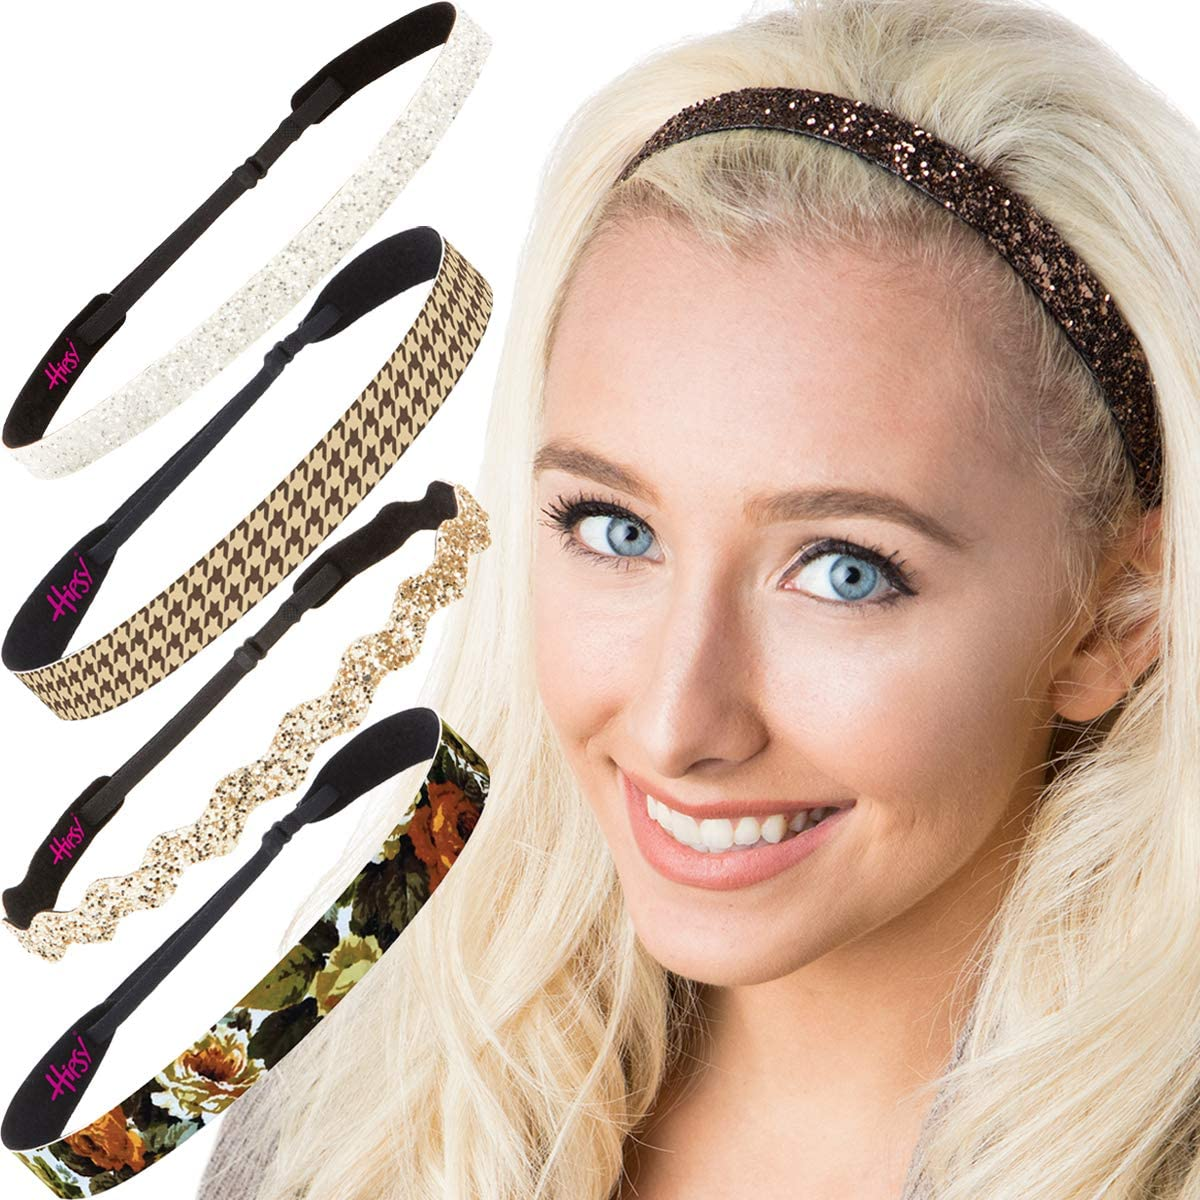 Hipsy Women's Adjustable NO Slip Houndstooth Wide Fashion Headband Multi Packs